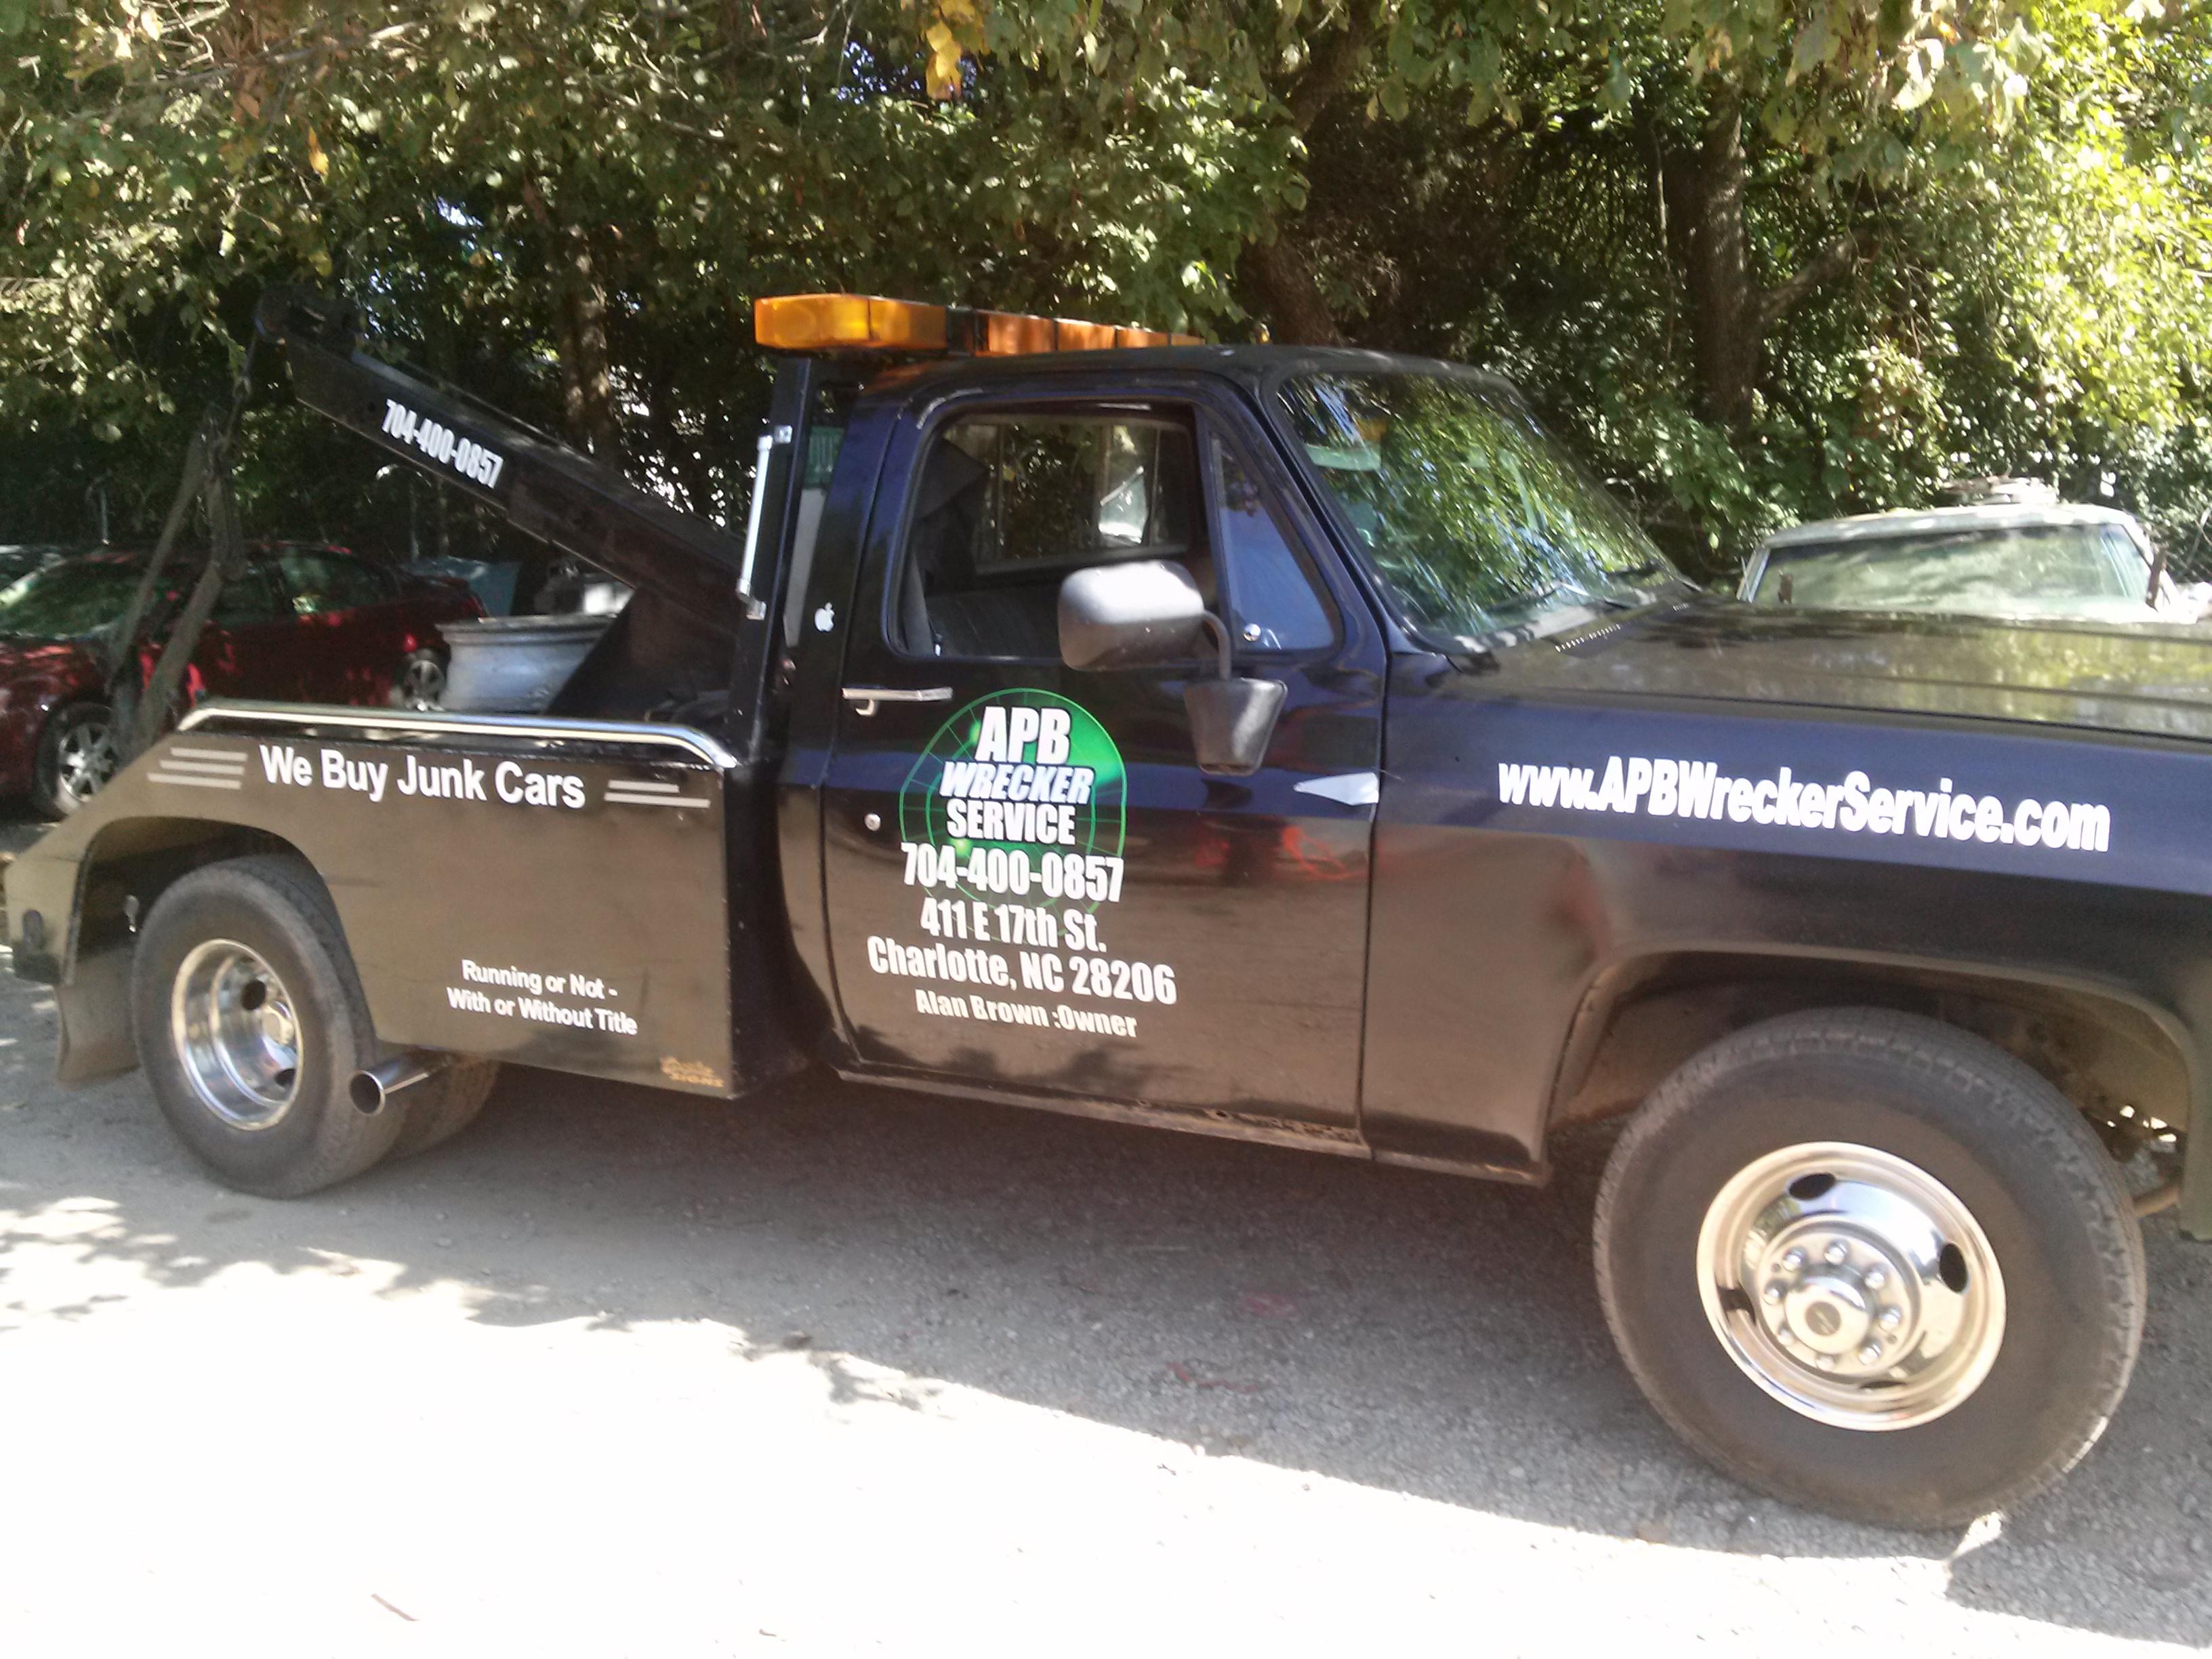 APB Wrecker Service 504 E 22nd St, Charlotte, NC 28206 - YP.com